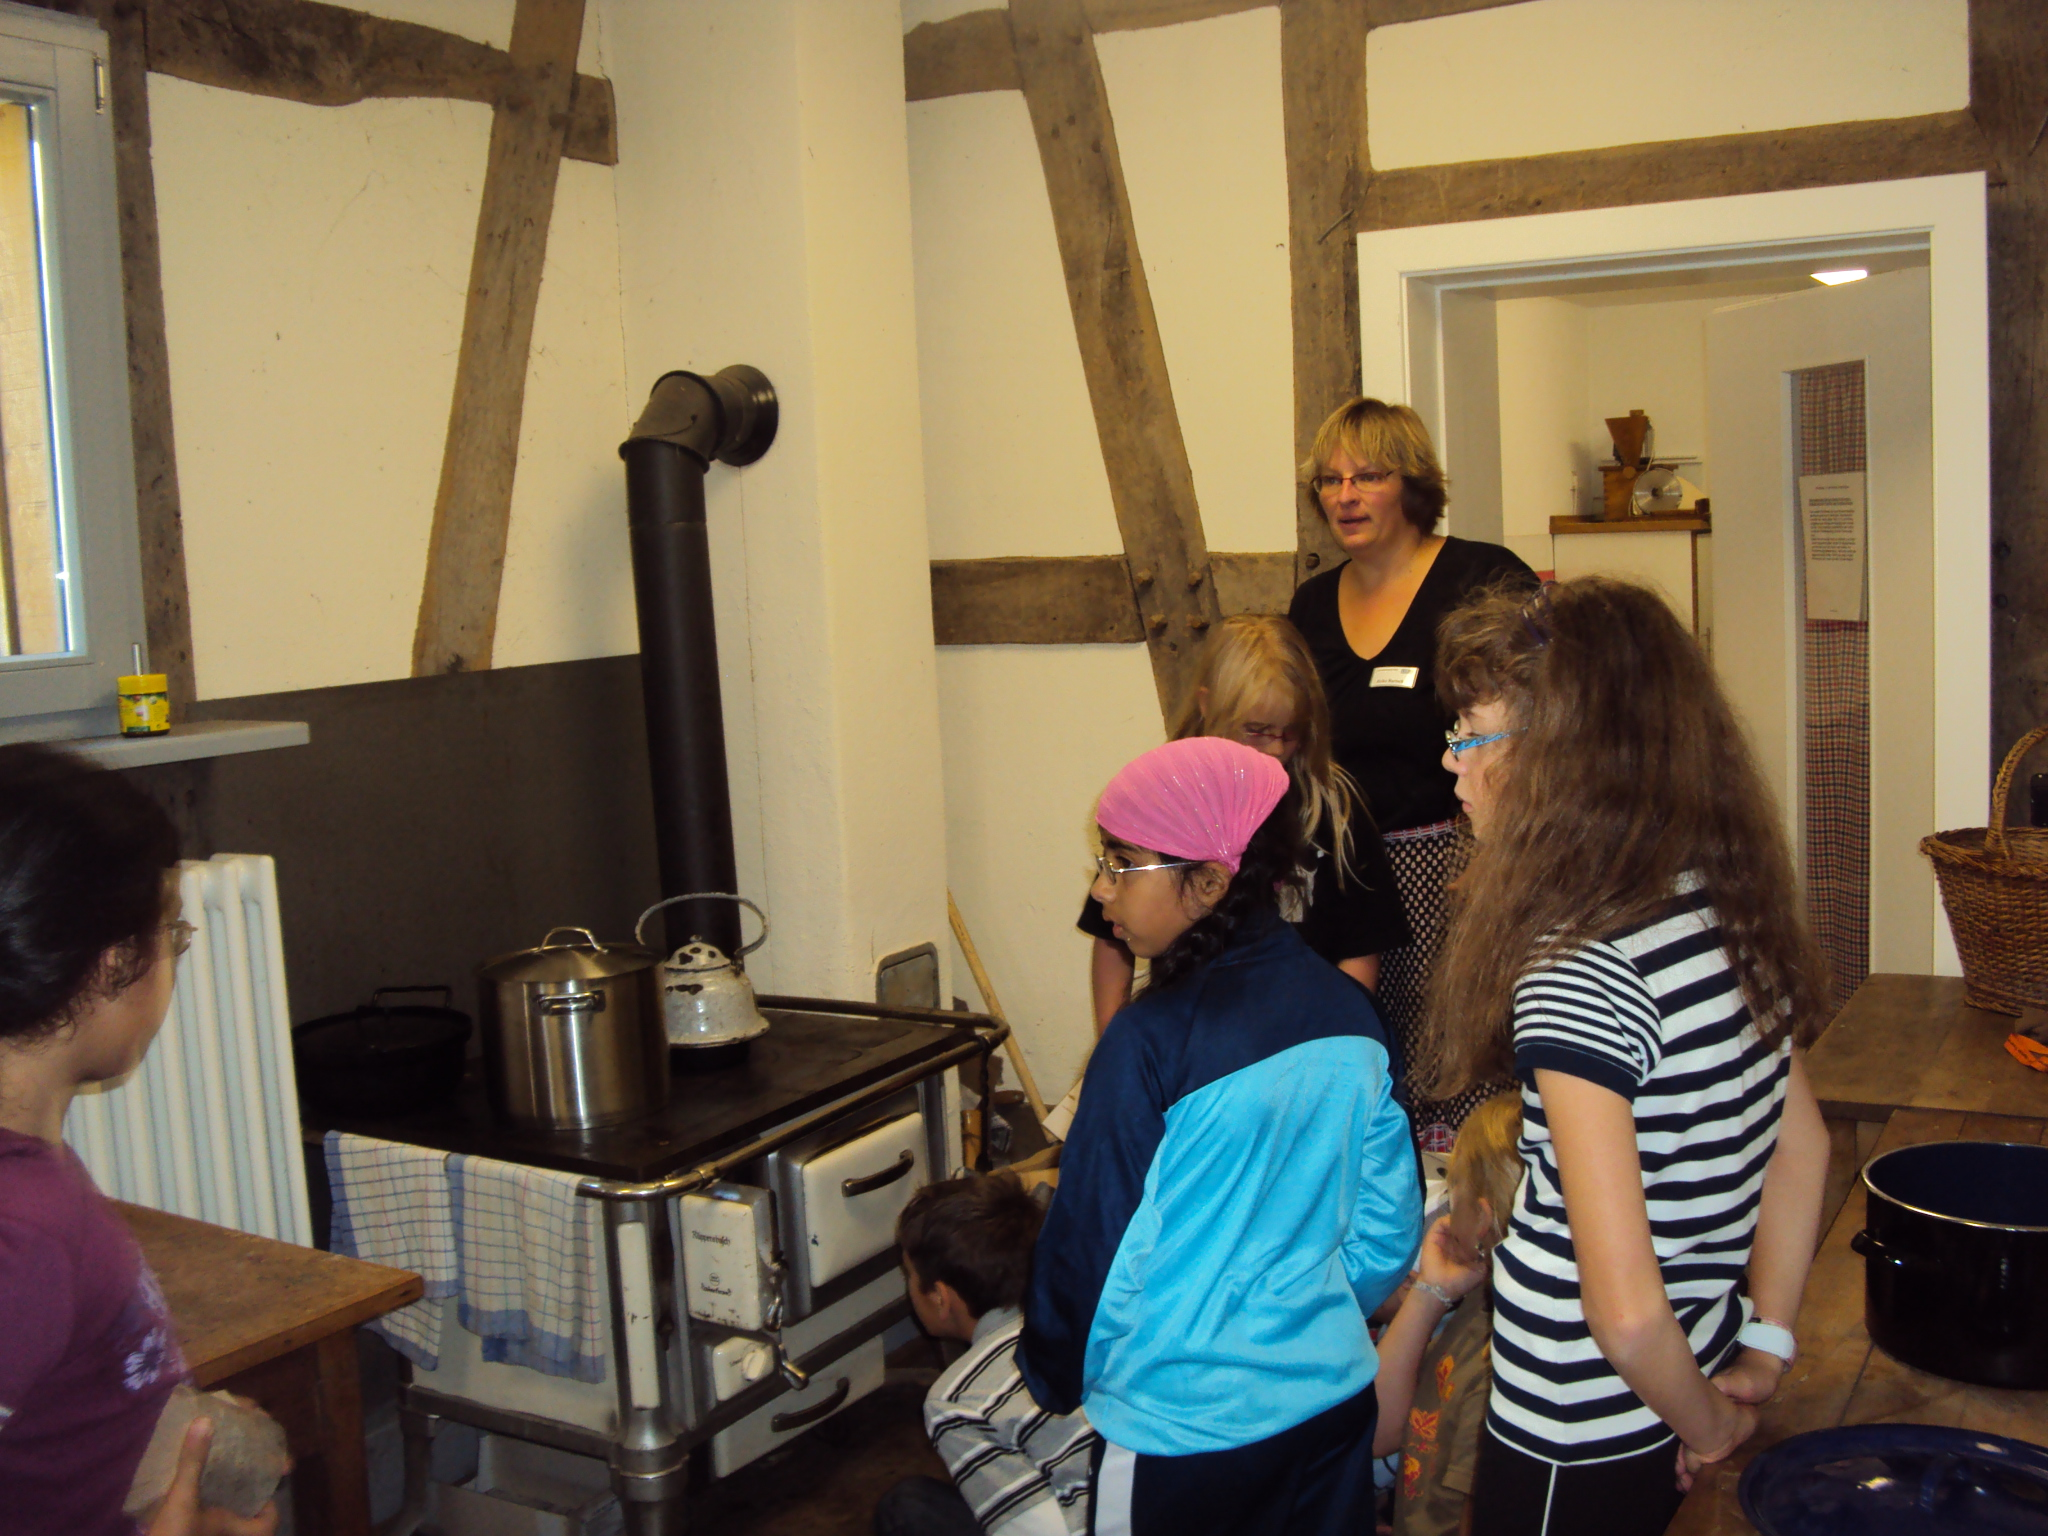 LVR Freilichtmuseum Lindlar: Leben ohne Strom